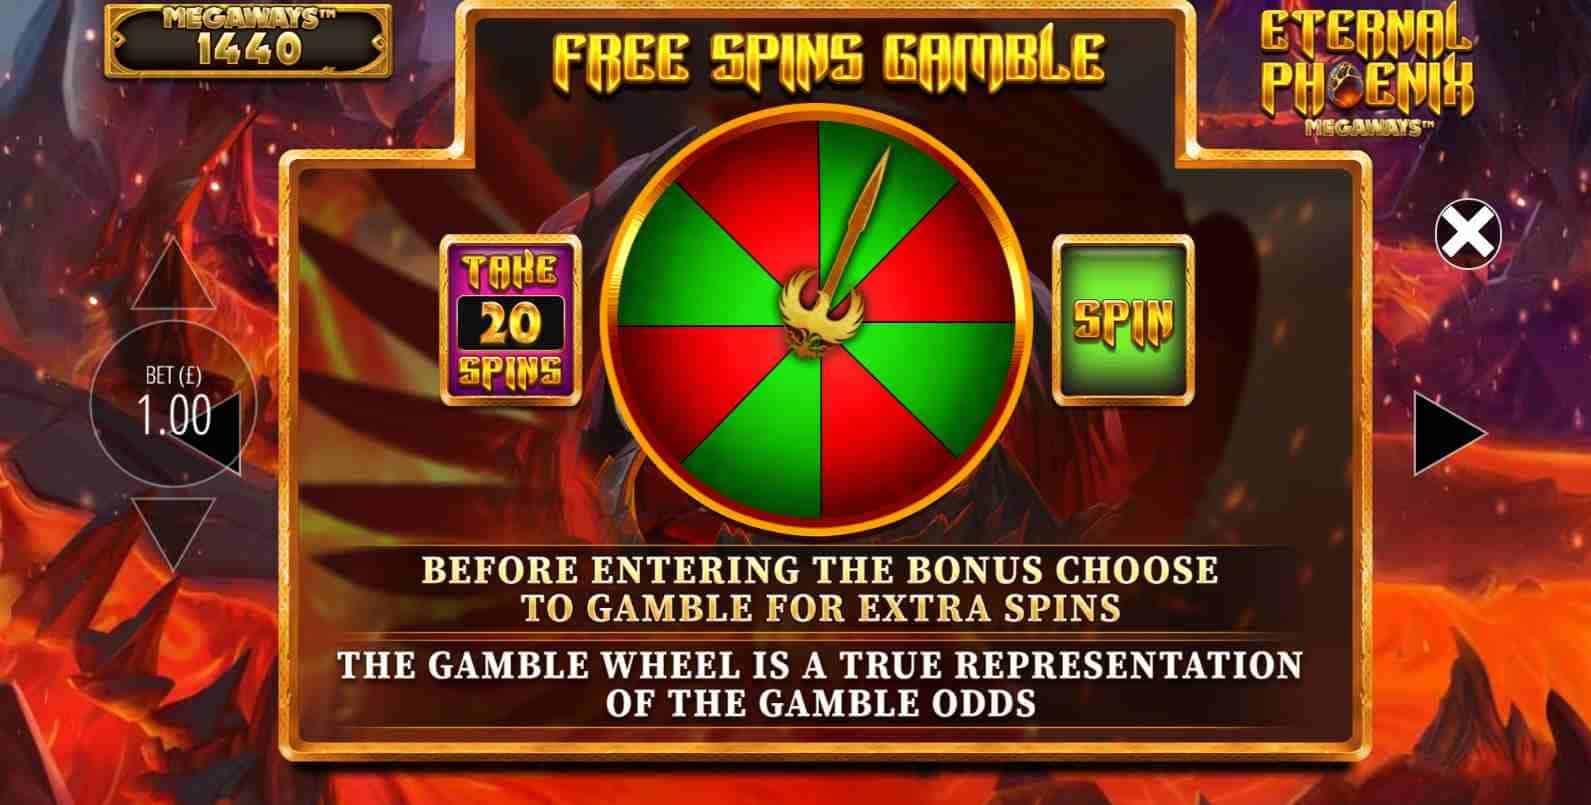 Eternal Phoenix Megaways Gamble Wheel